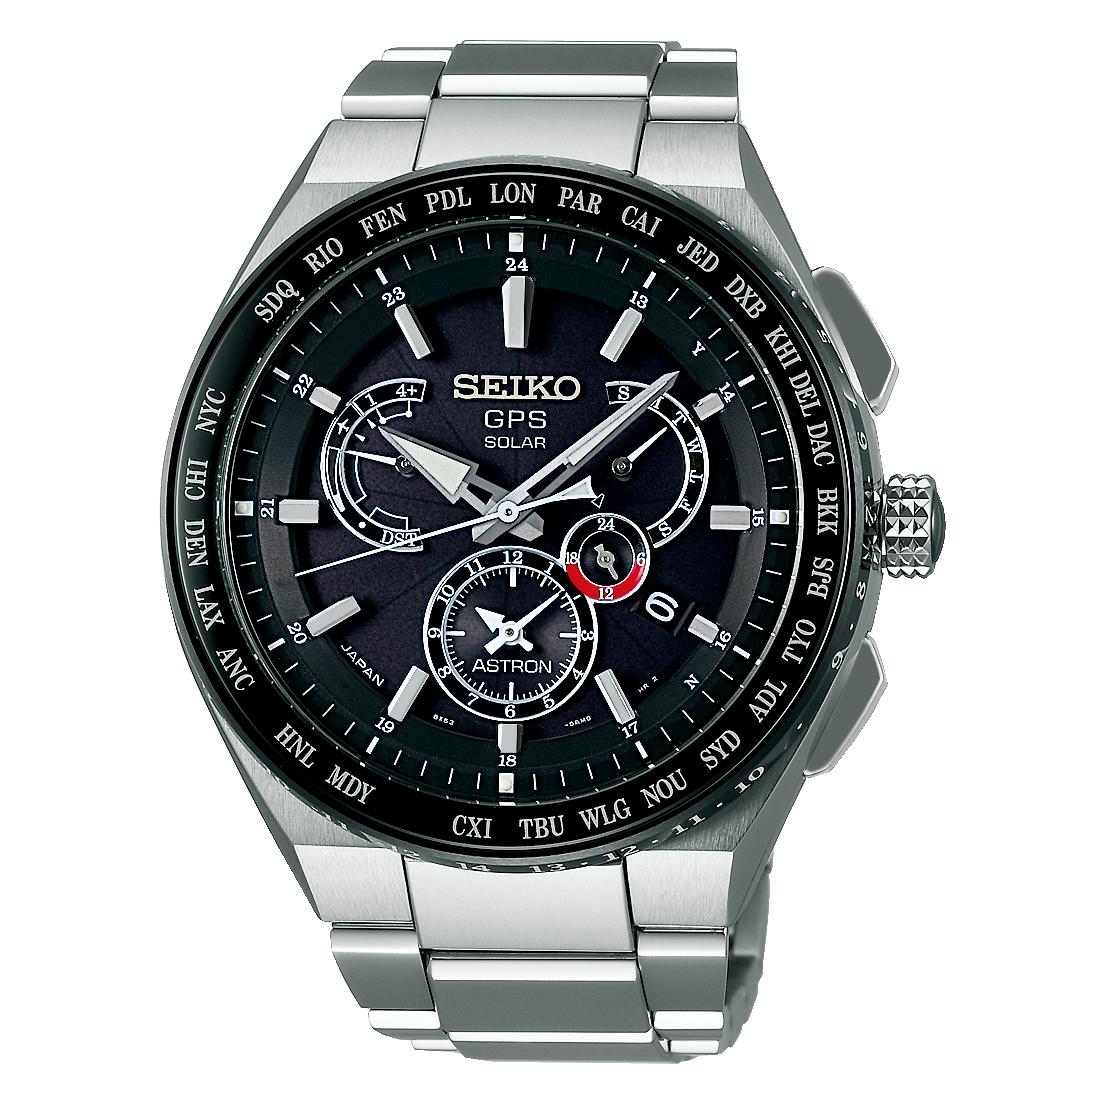 SEIKO ASTRON/セイコー アストロン SBXB123 8X53 Executive Line Titanium Models